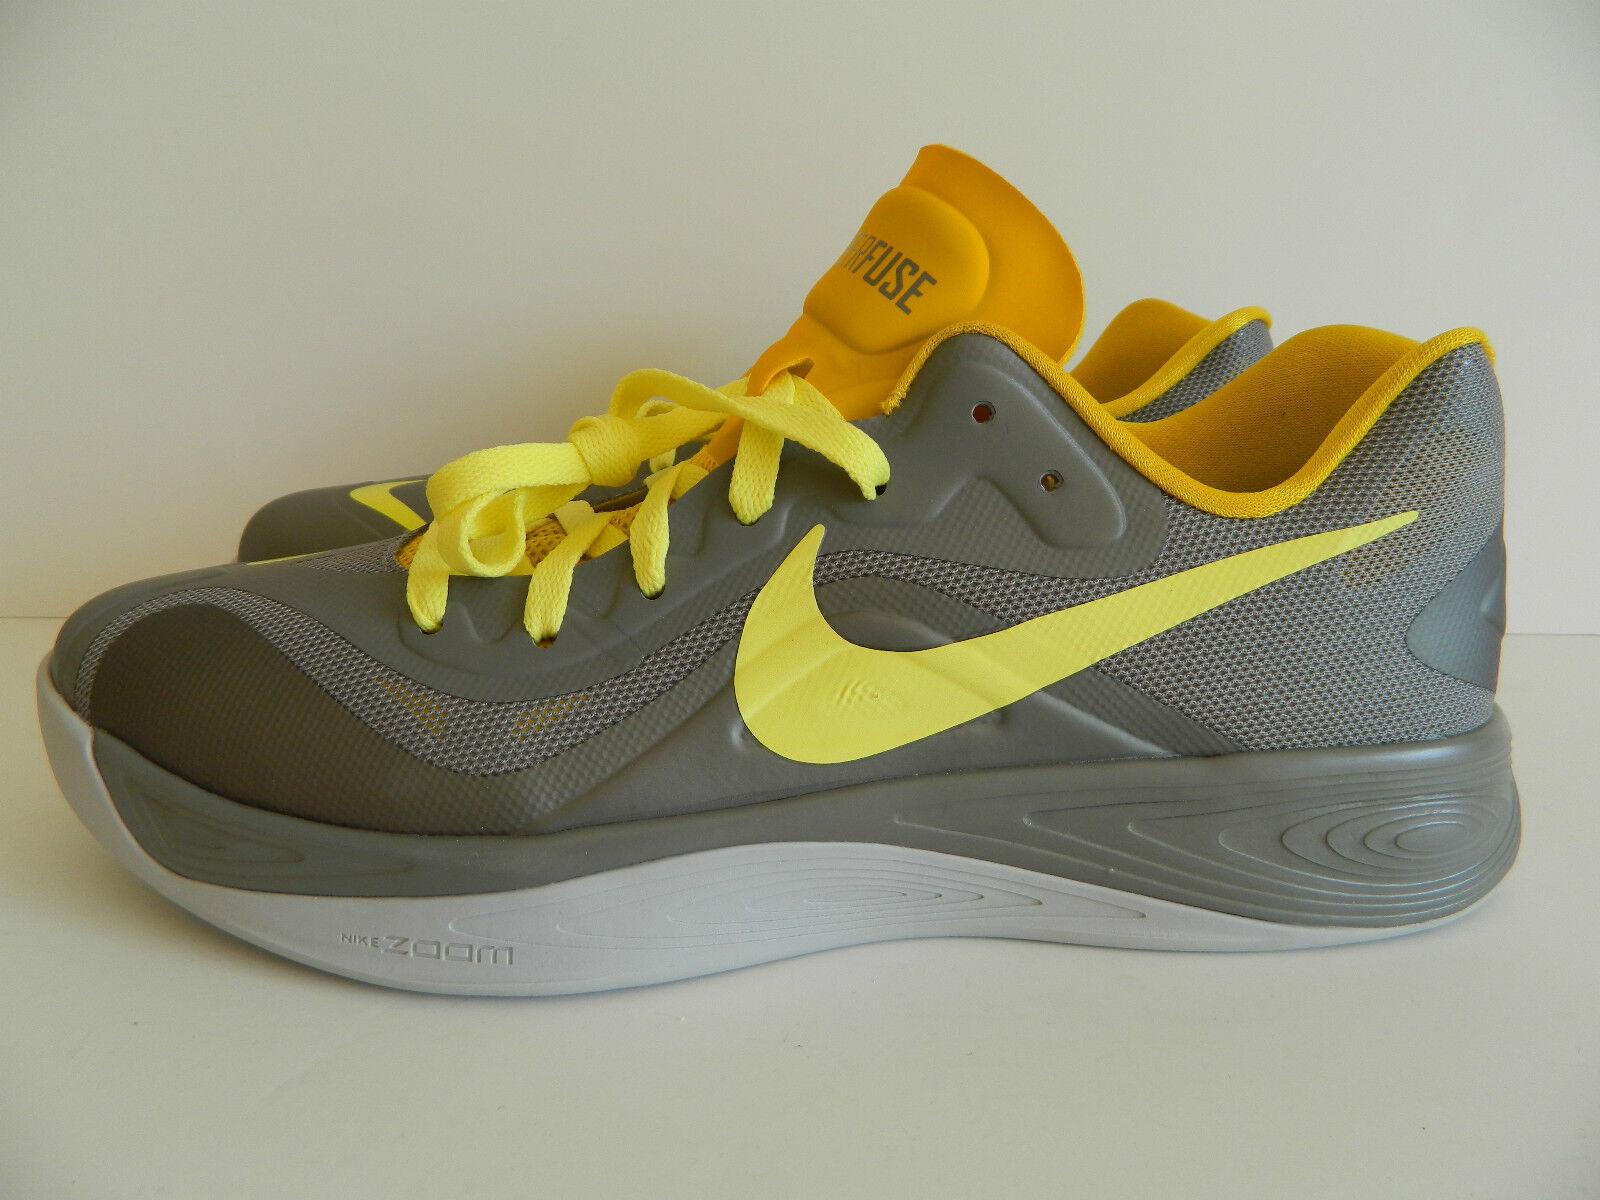 Nike Hyperfuse Low ( Sprt Grey Electrc Yellow-Strt Grey ) ( 555034 001 ) NIB